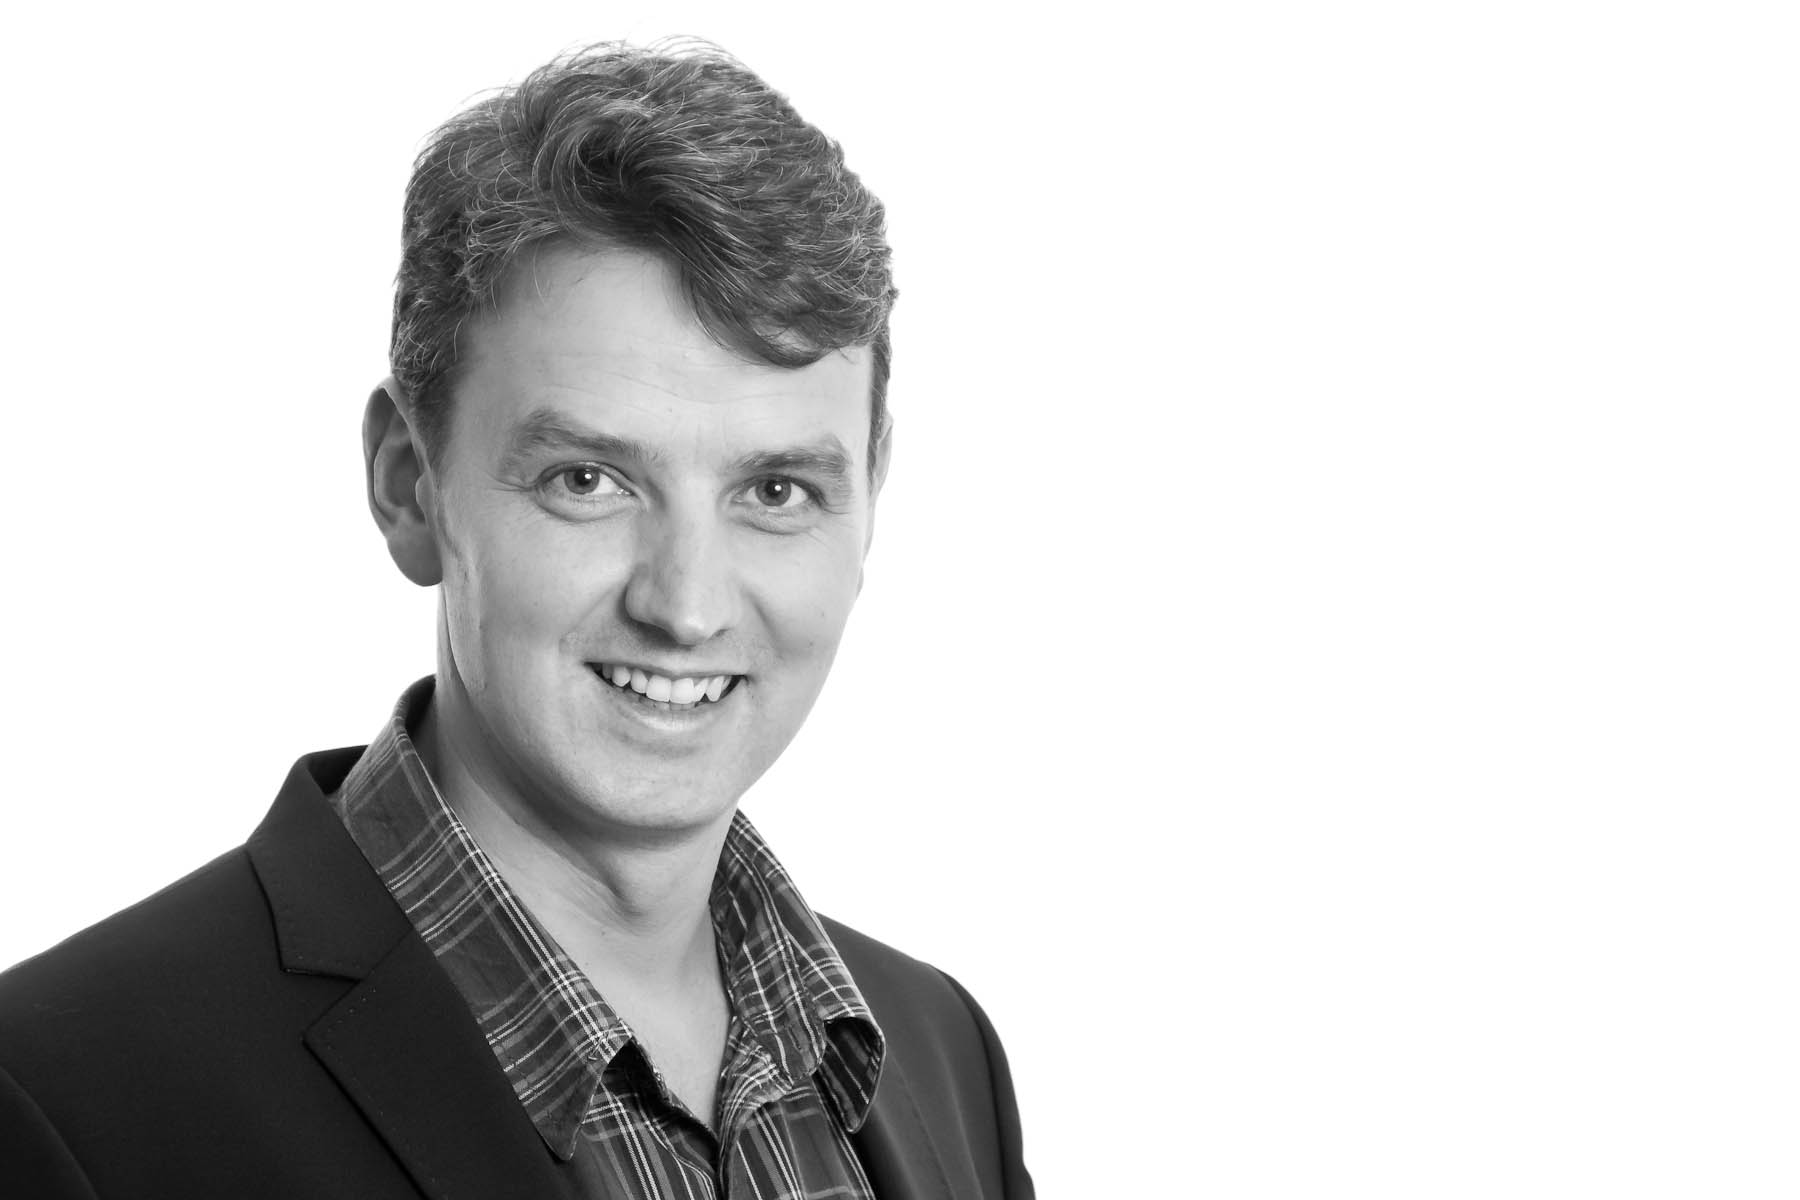 Business Portrait Martin Frick